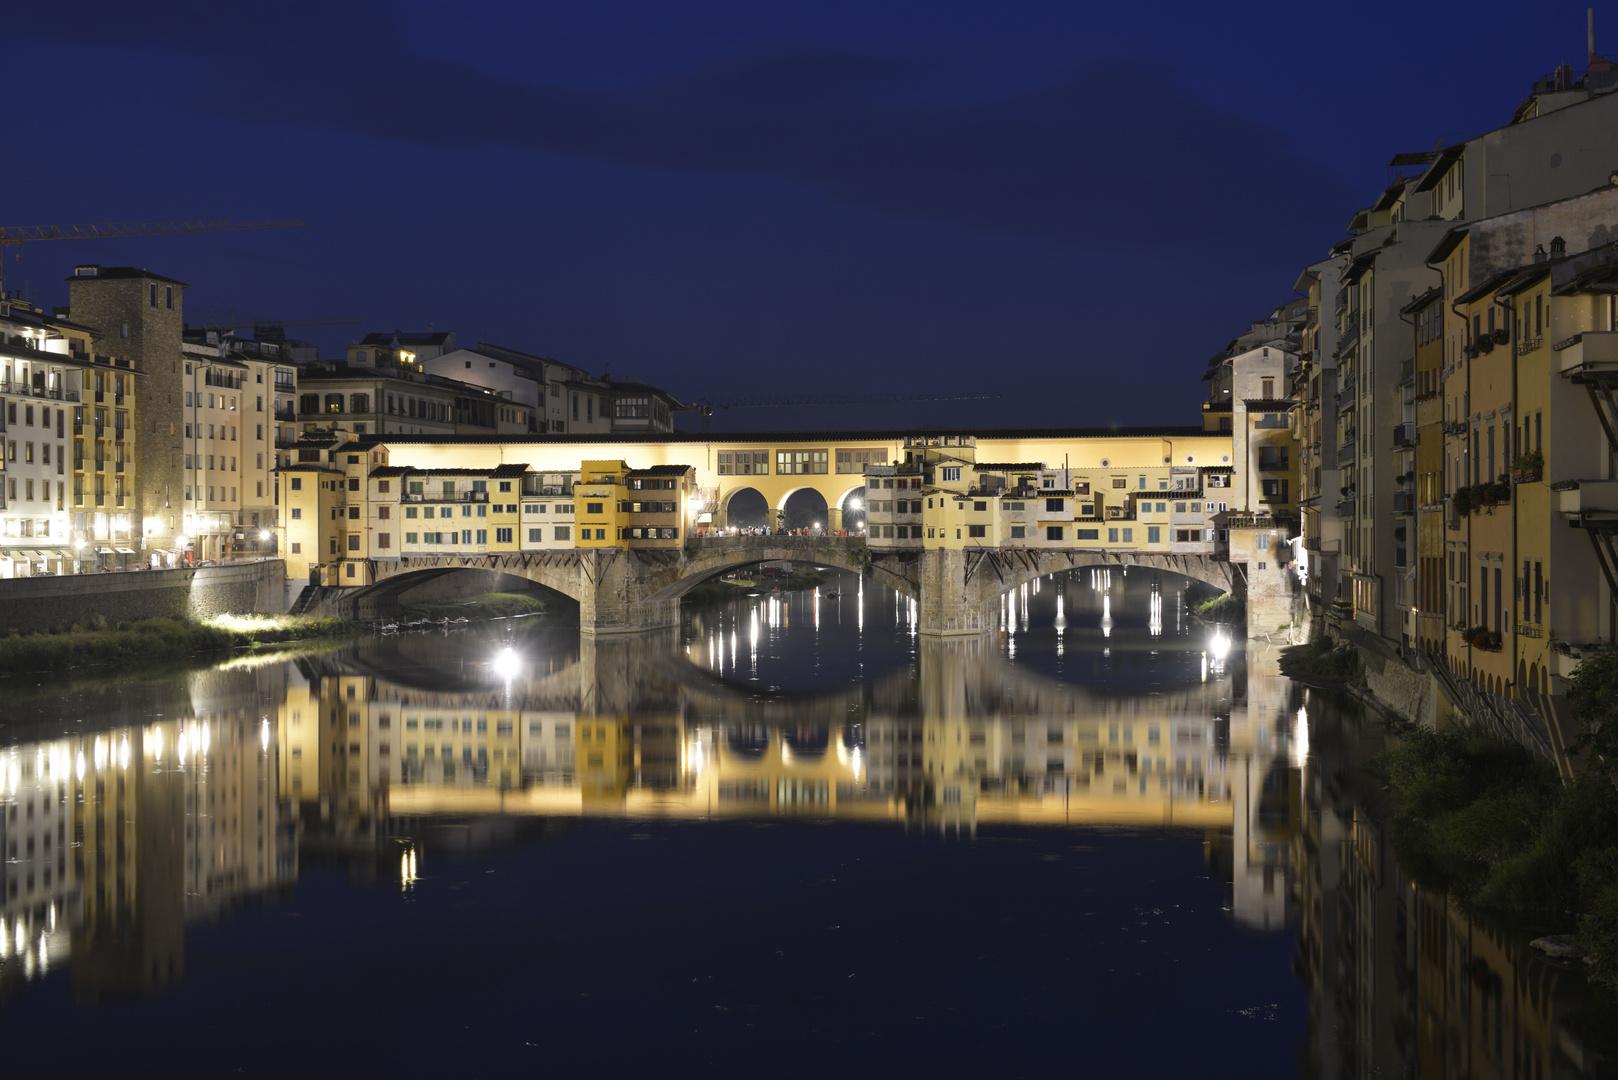 Spaziergang nachts in Florenz